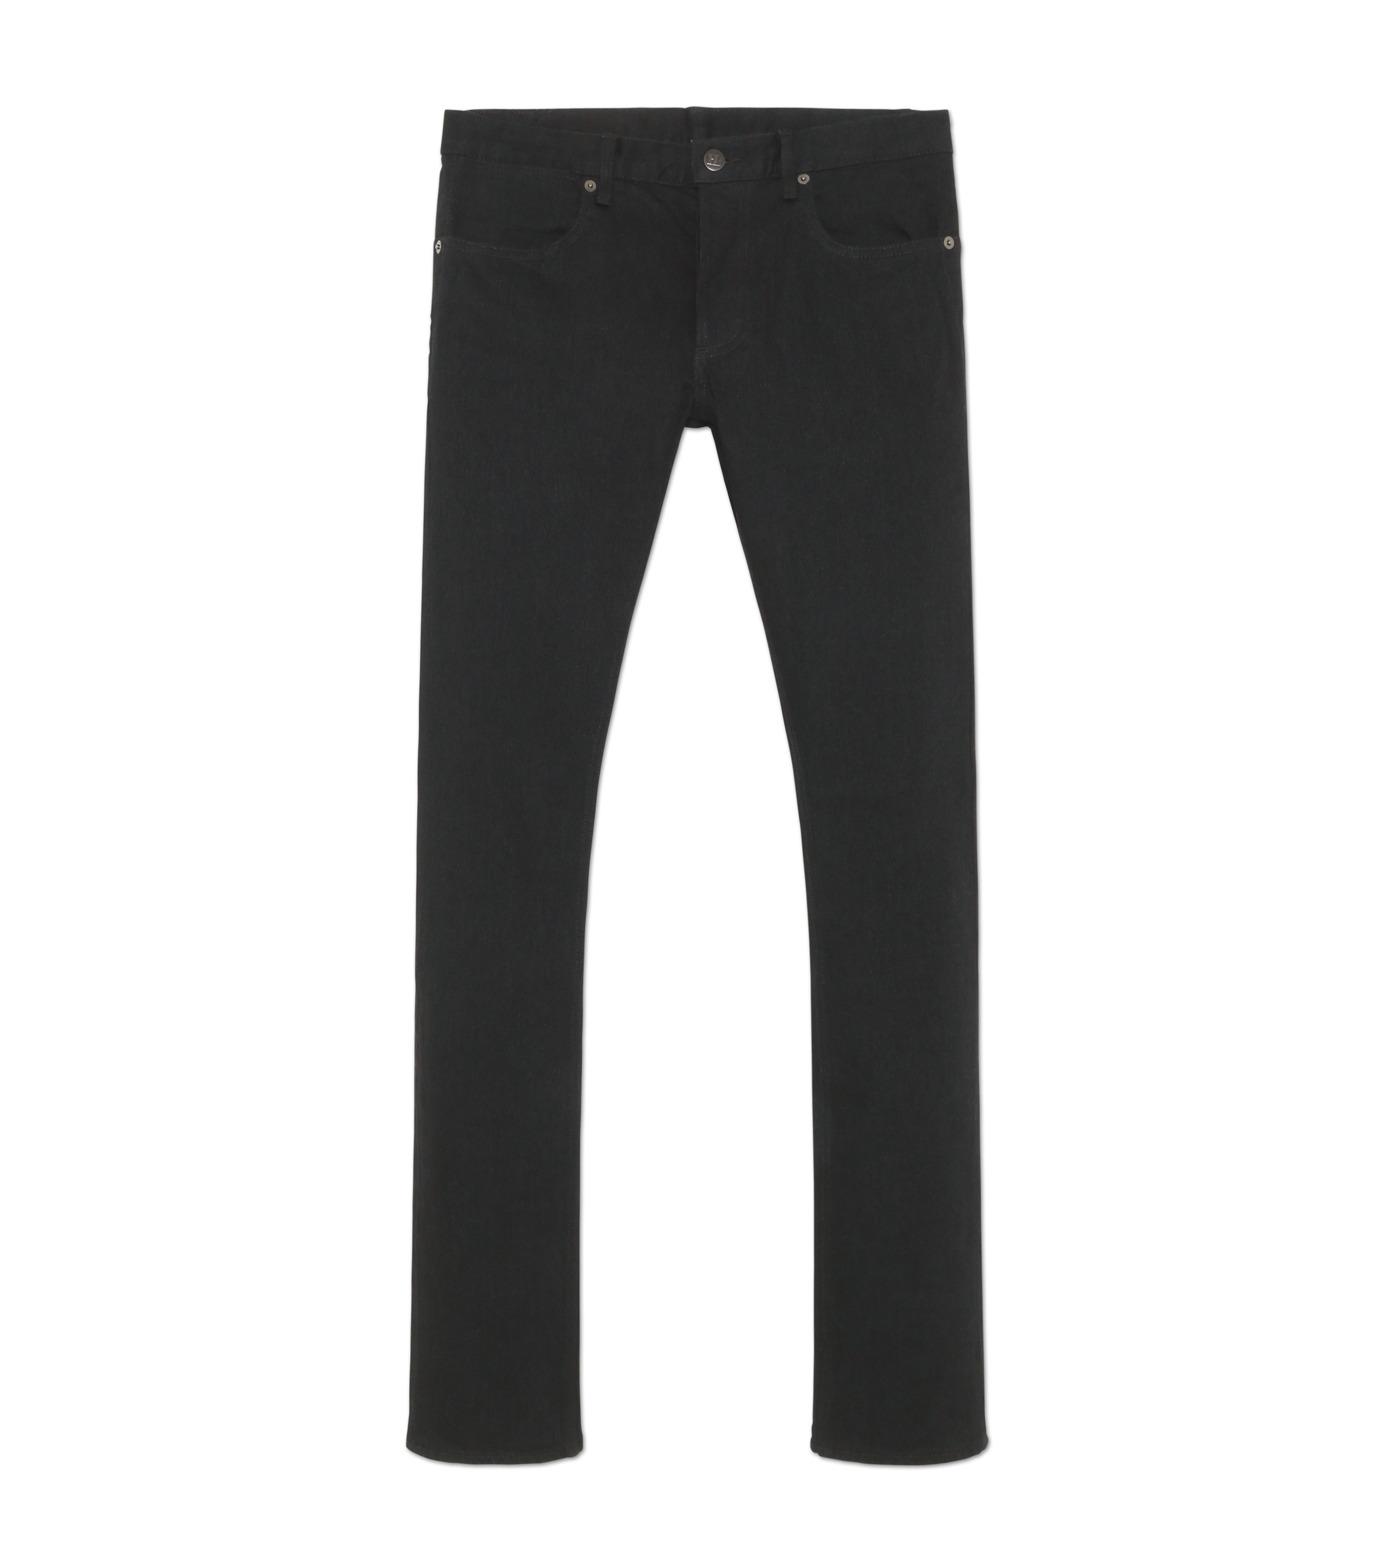 HL HEDDIE LOVU(エイチエル・エディールーヴ)のHL SUPER SLIM-BLACK(パンツ/pants)-18S98010-13 拡大詳細画像4